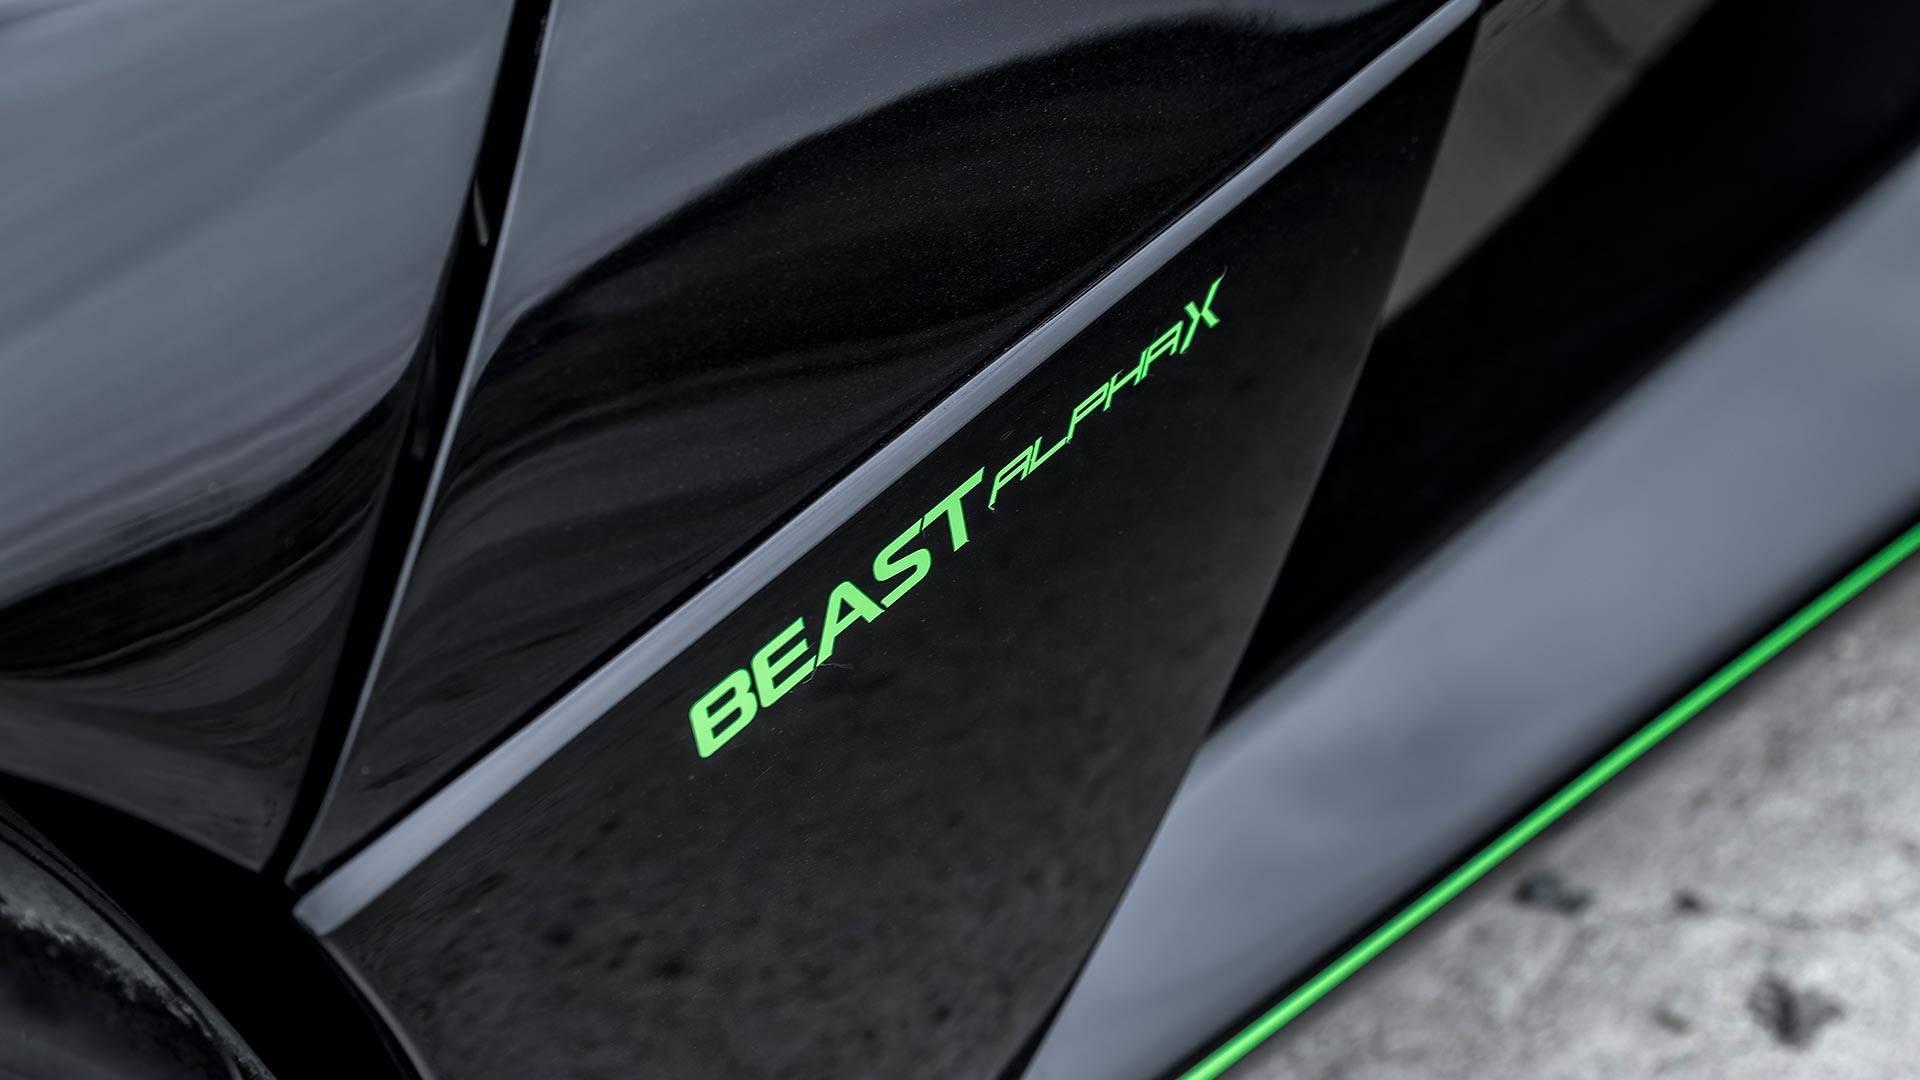 sieu-xe-rezvani-beast-alpha-x-blackbird-dong-co-2-5l-nhung-cong-suat-toi-700-ma-luc